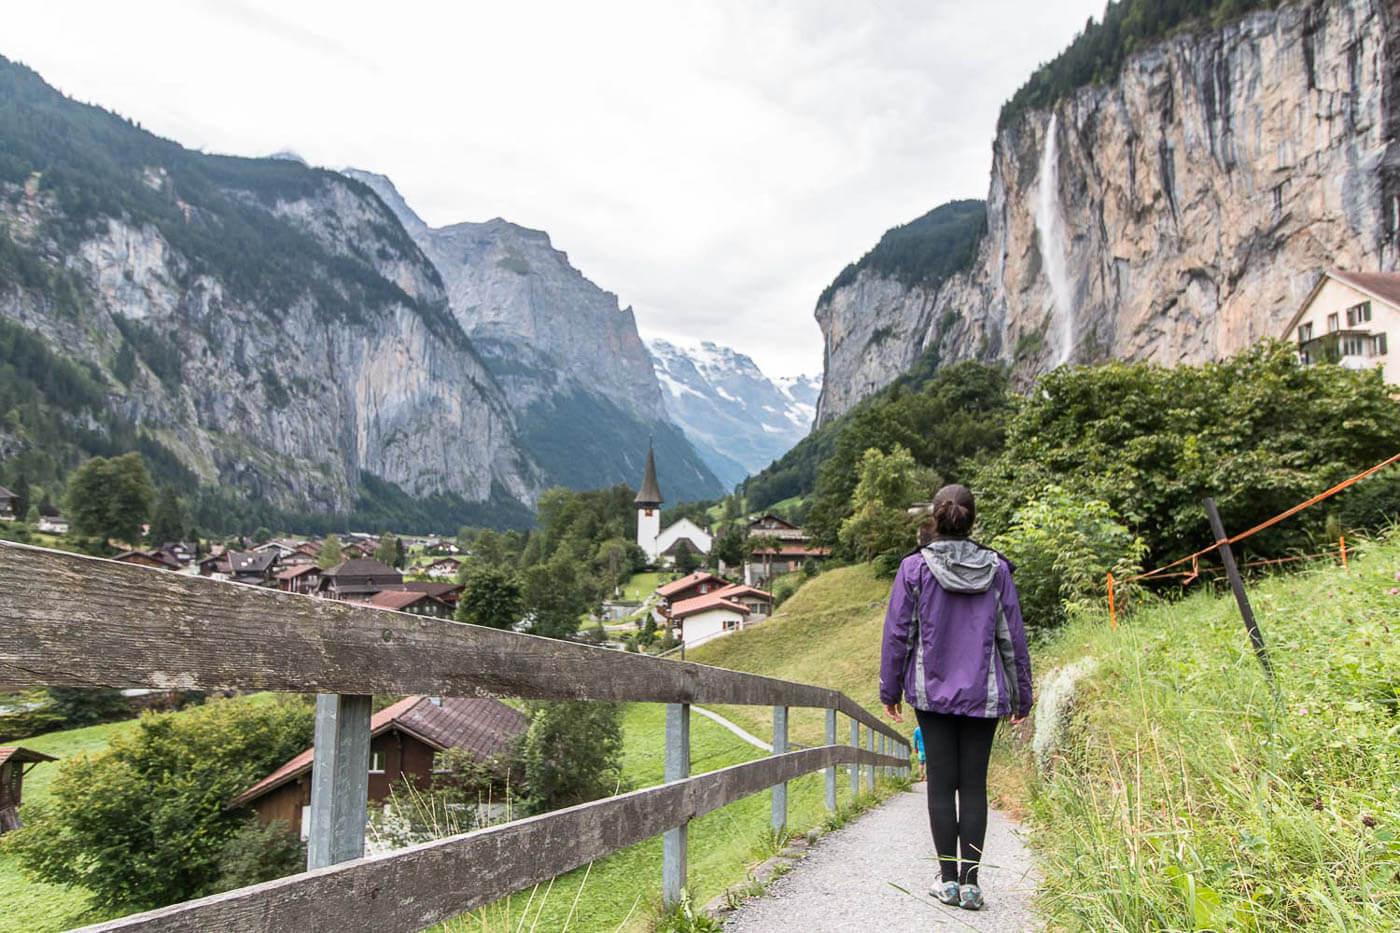 Viagem para Suíça - Turismo para Suíça - Lauterbrunnem